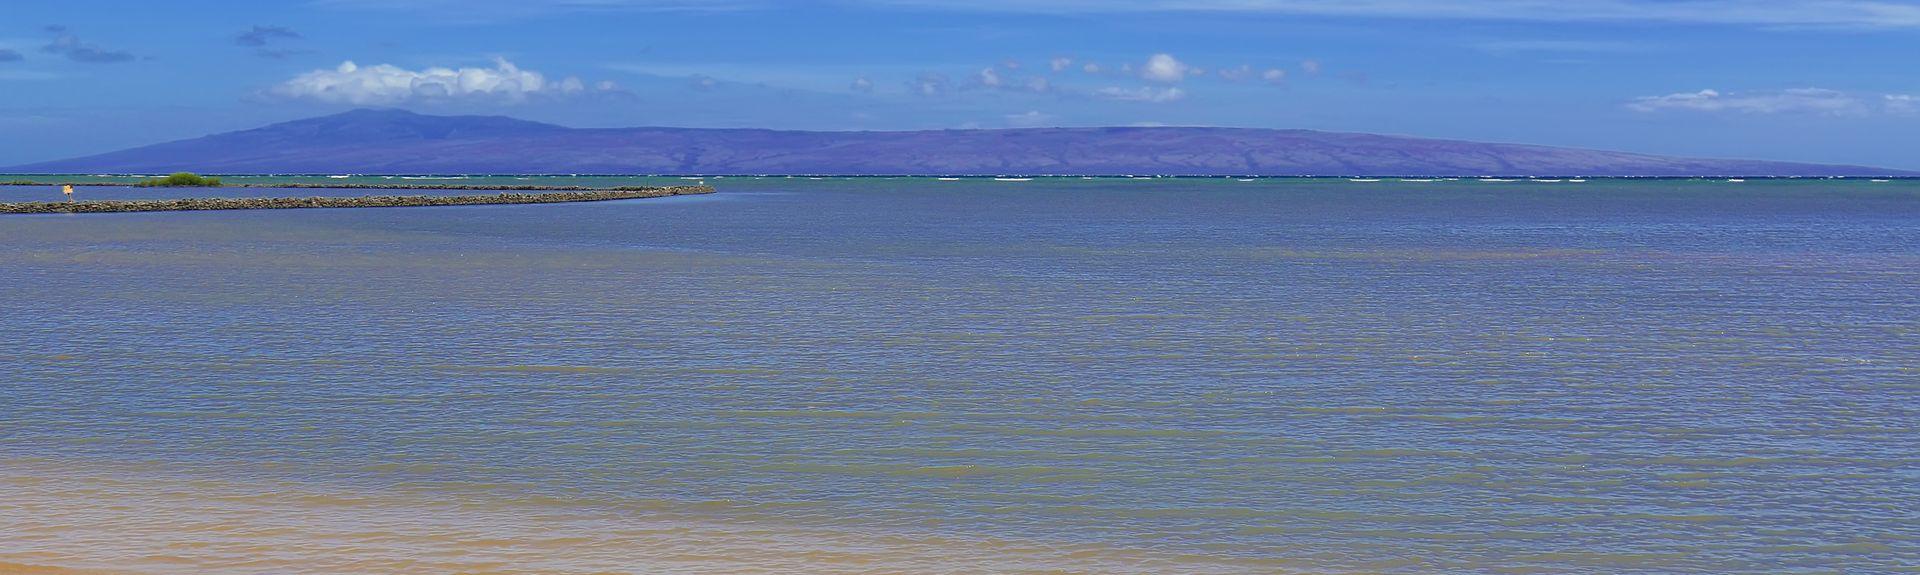 Kualapuu, Hawaï, Verenigde Staten